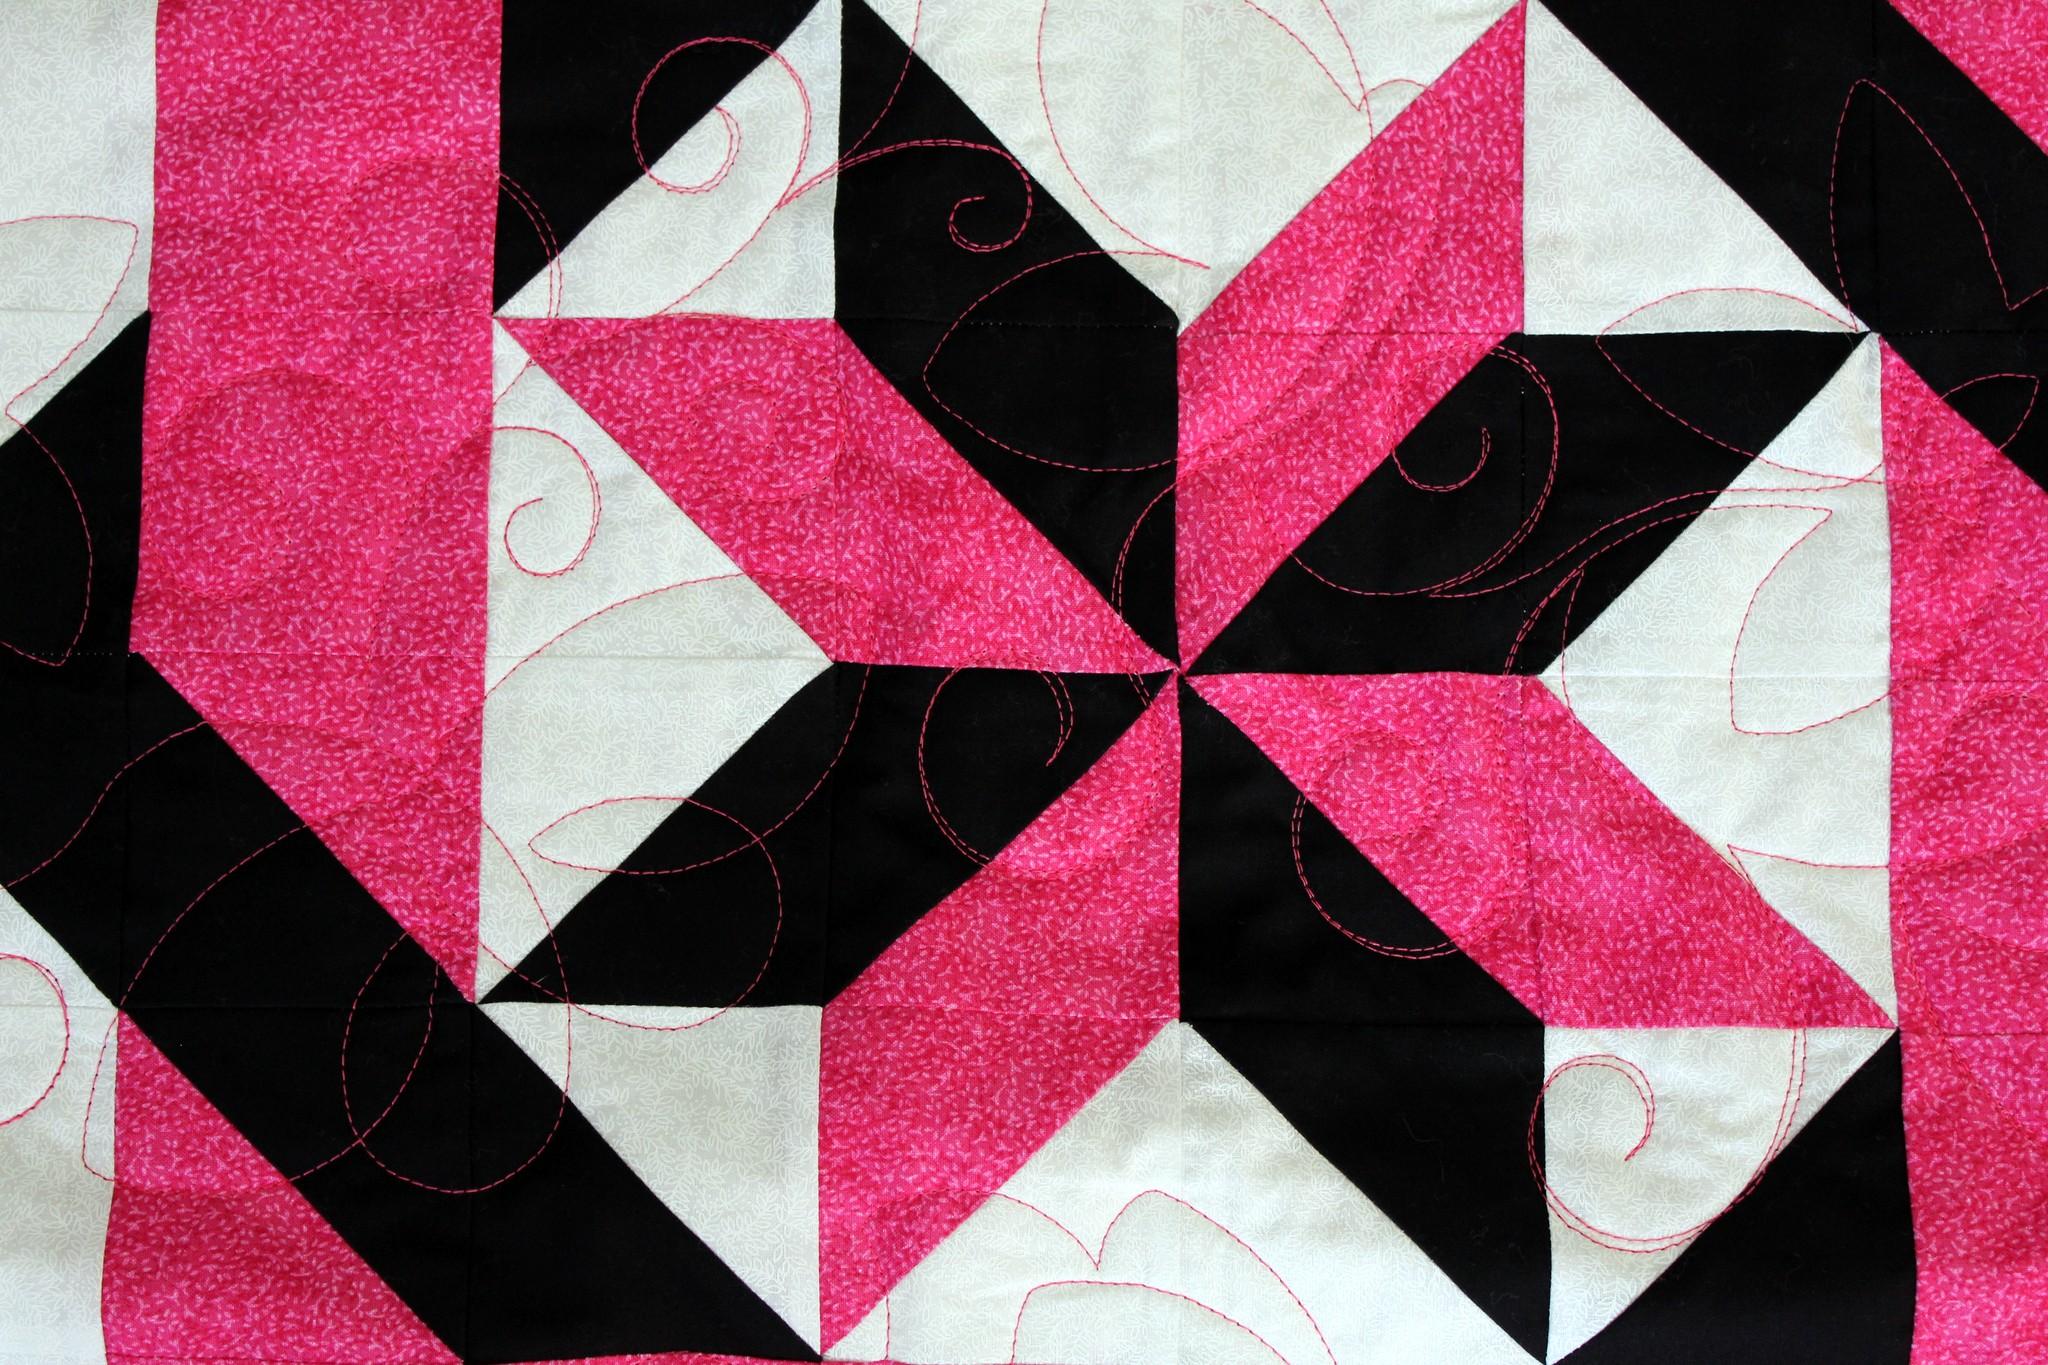 Stars and Interlocking Squares Quilt